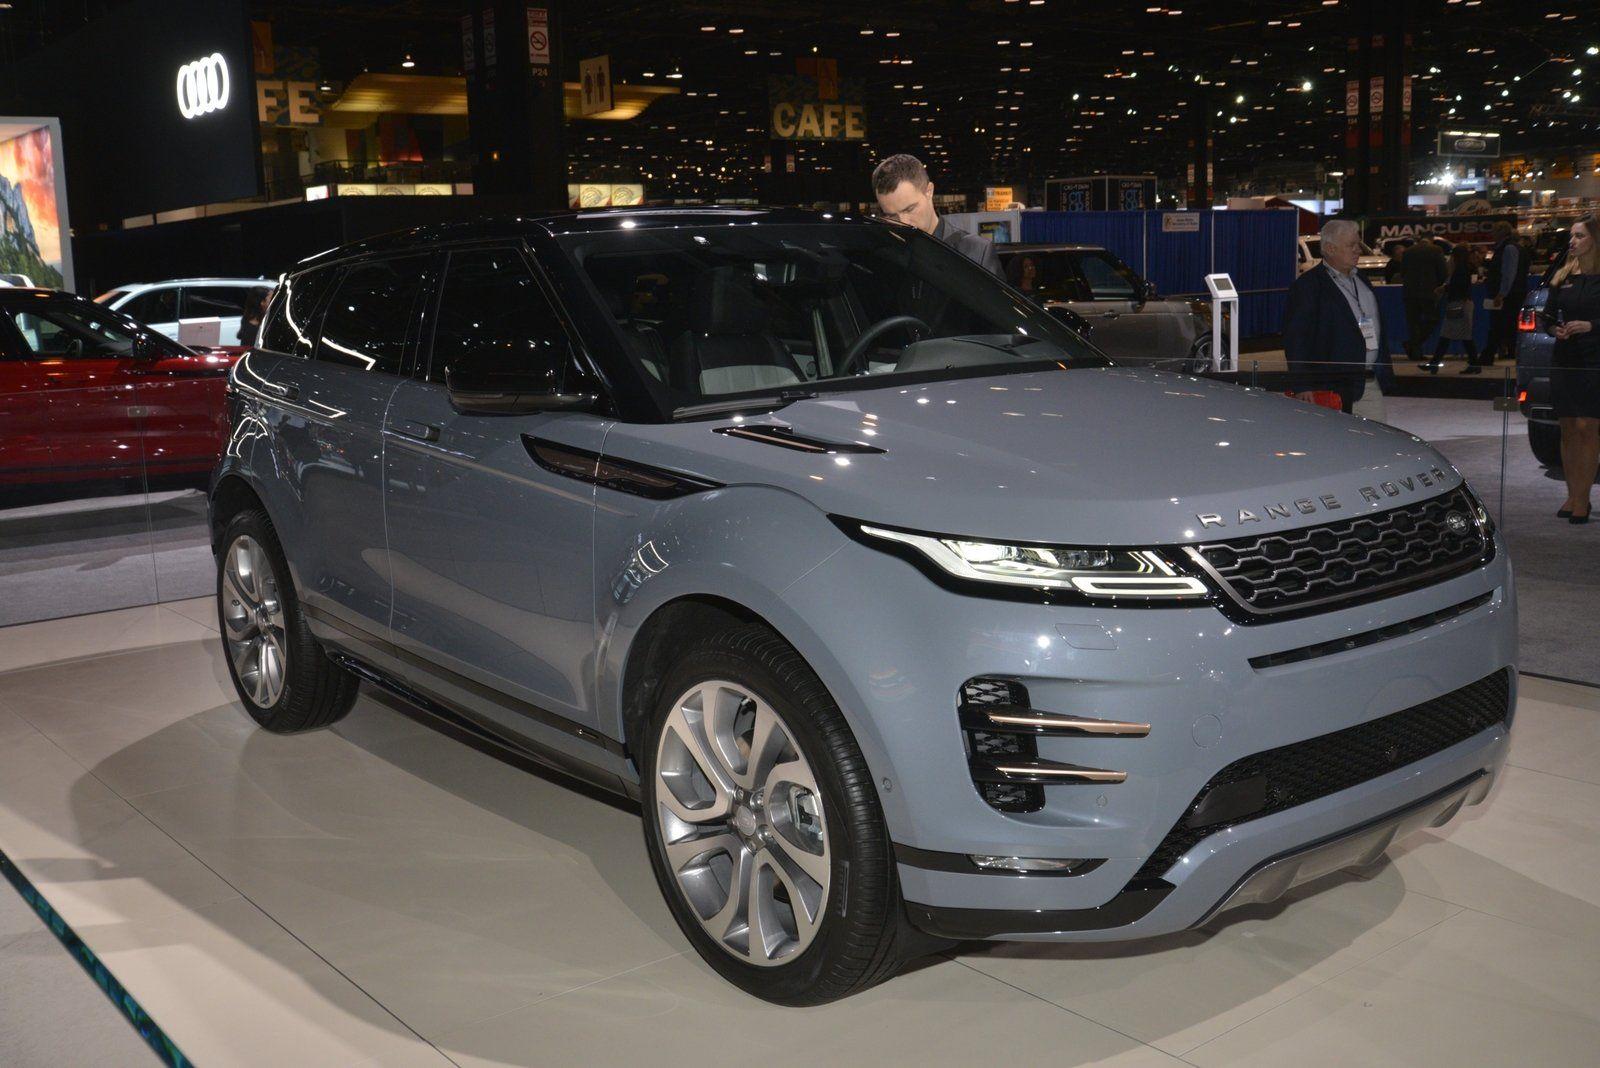 The 2020 Land Rover Range Rover Evoque Adds Extra Luxury